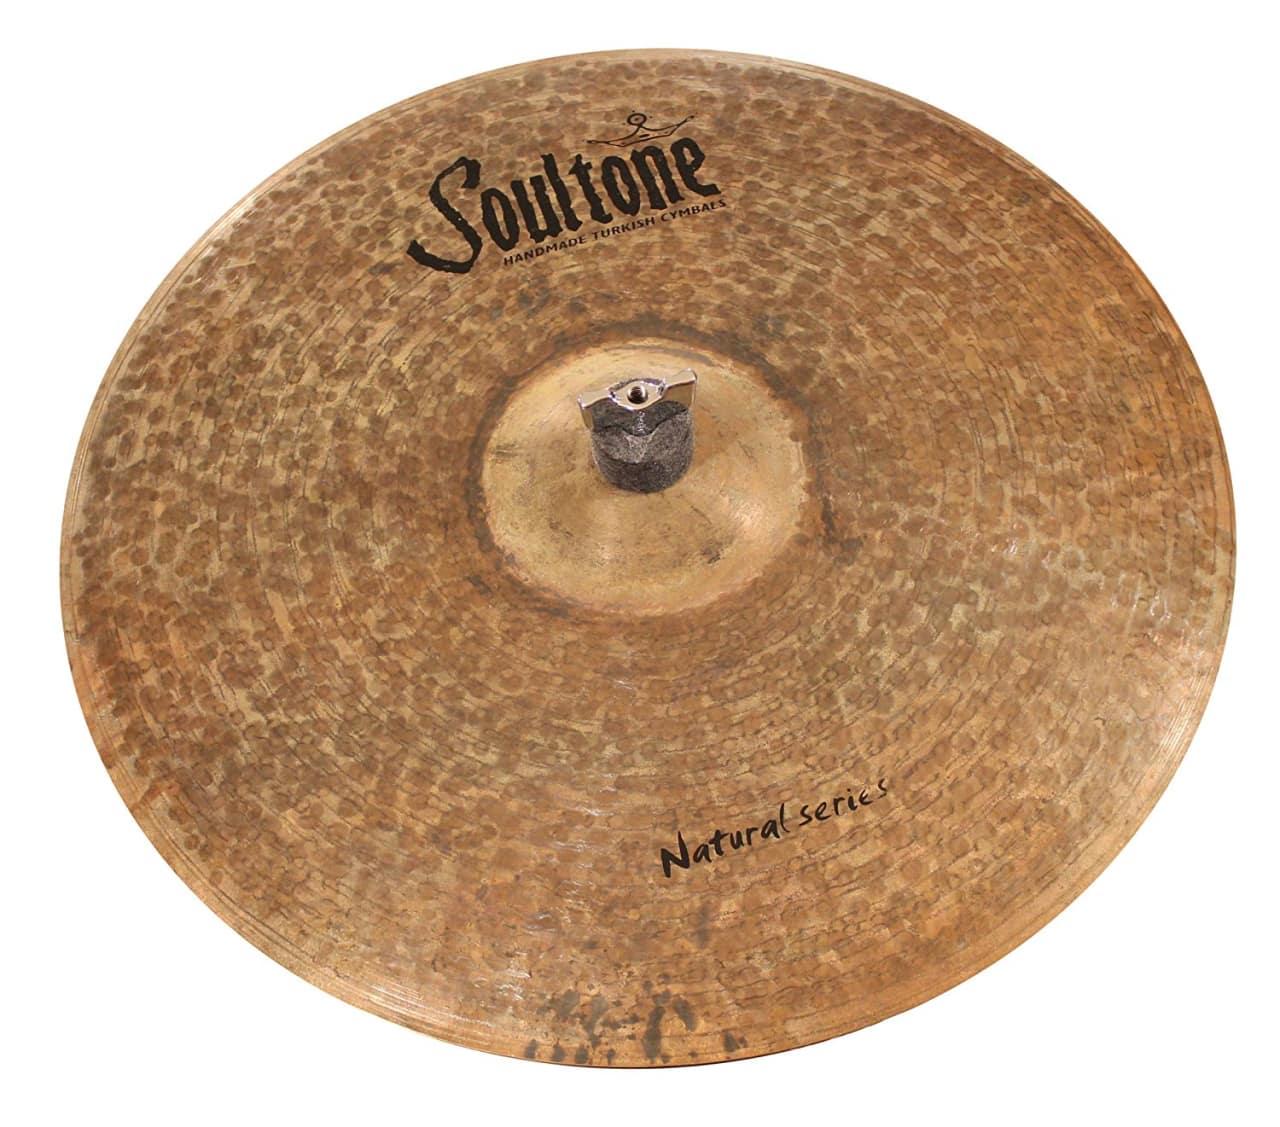 soultone natural 21 ride cymbals authorized dealer reverb. Black Bedroom Furniture Sets. Home Design Ideas